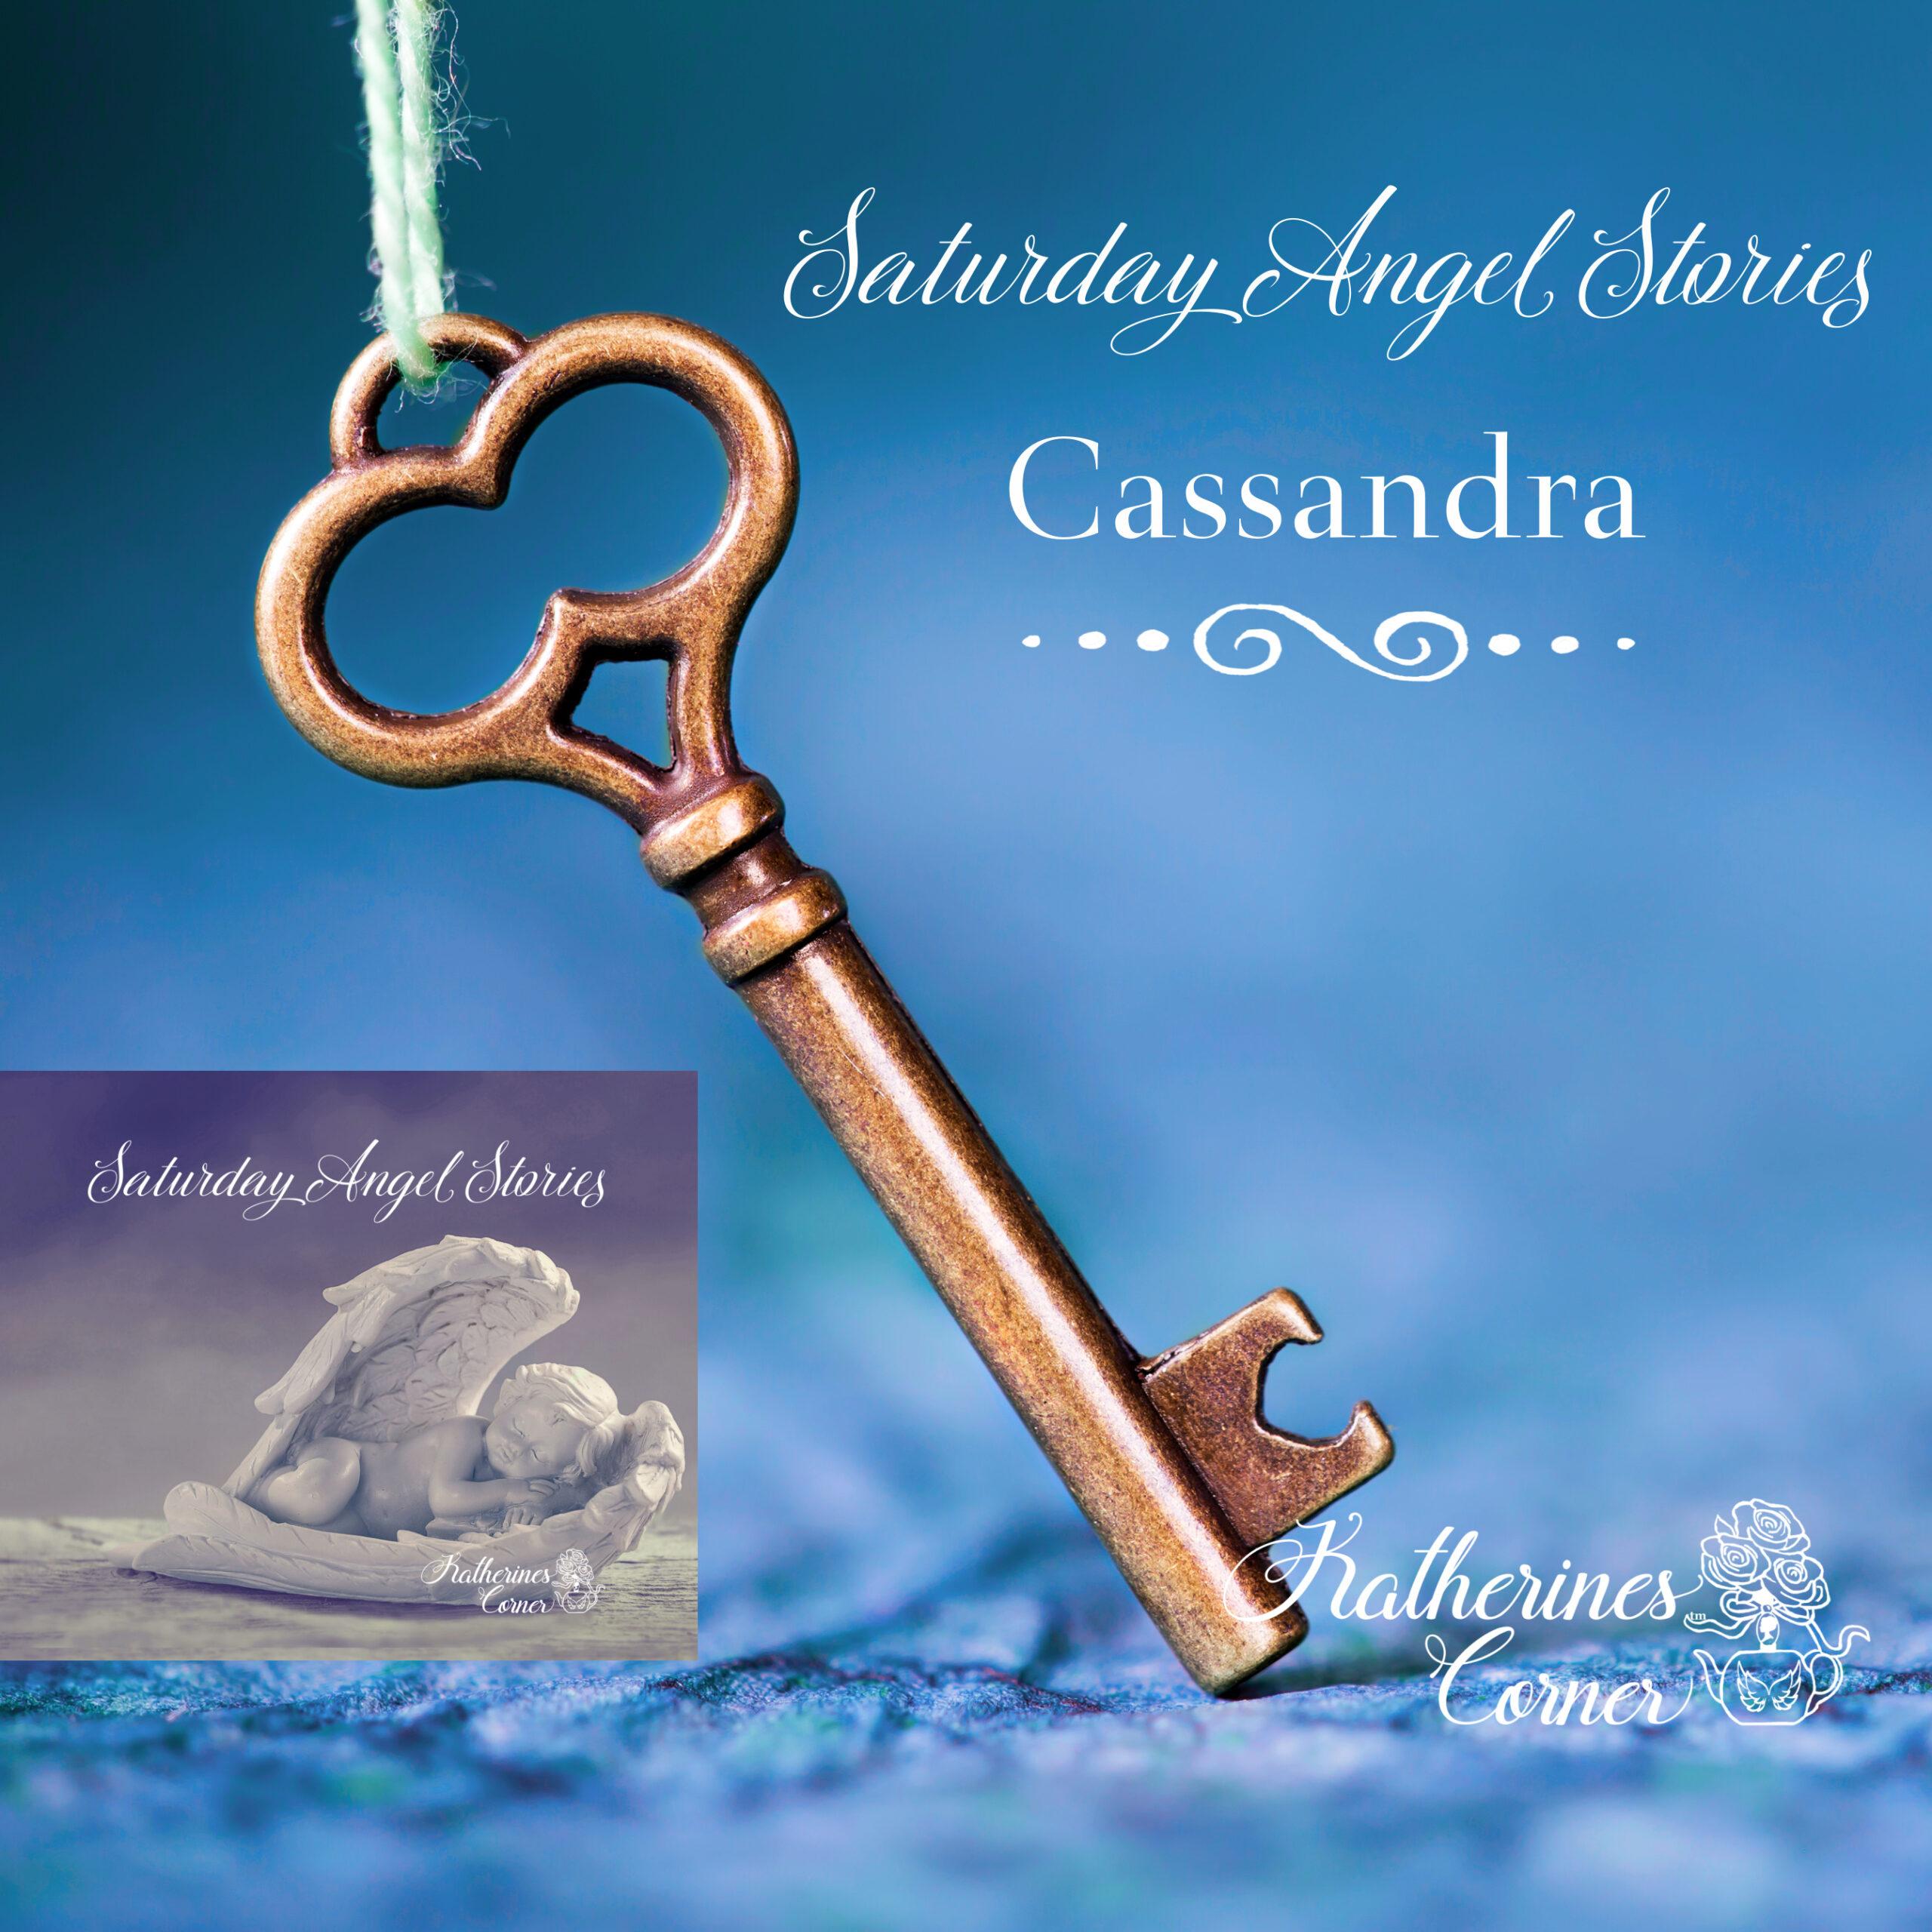 Saturday Angel Stories Cassandra